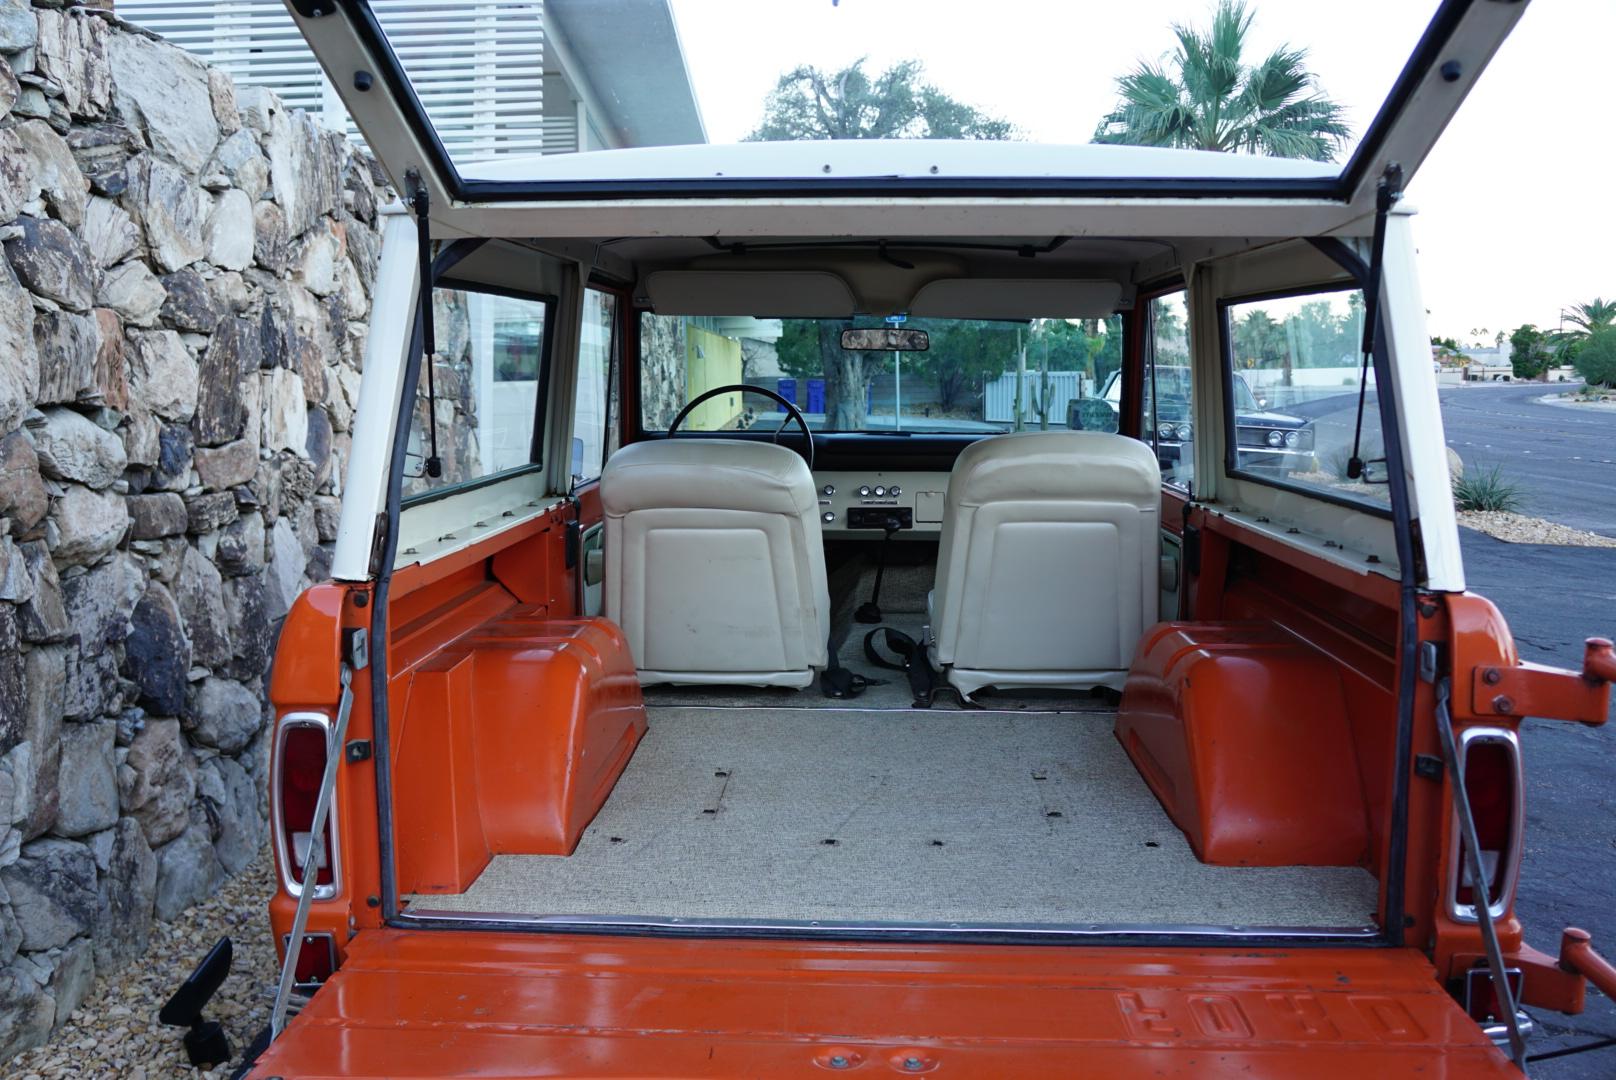 1974 Ford Bronco cargo